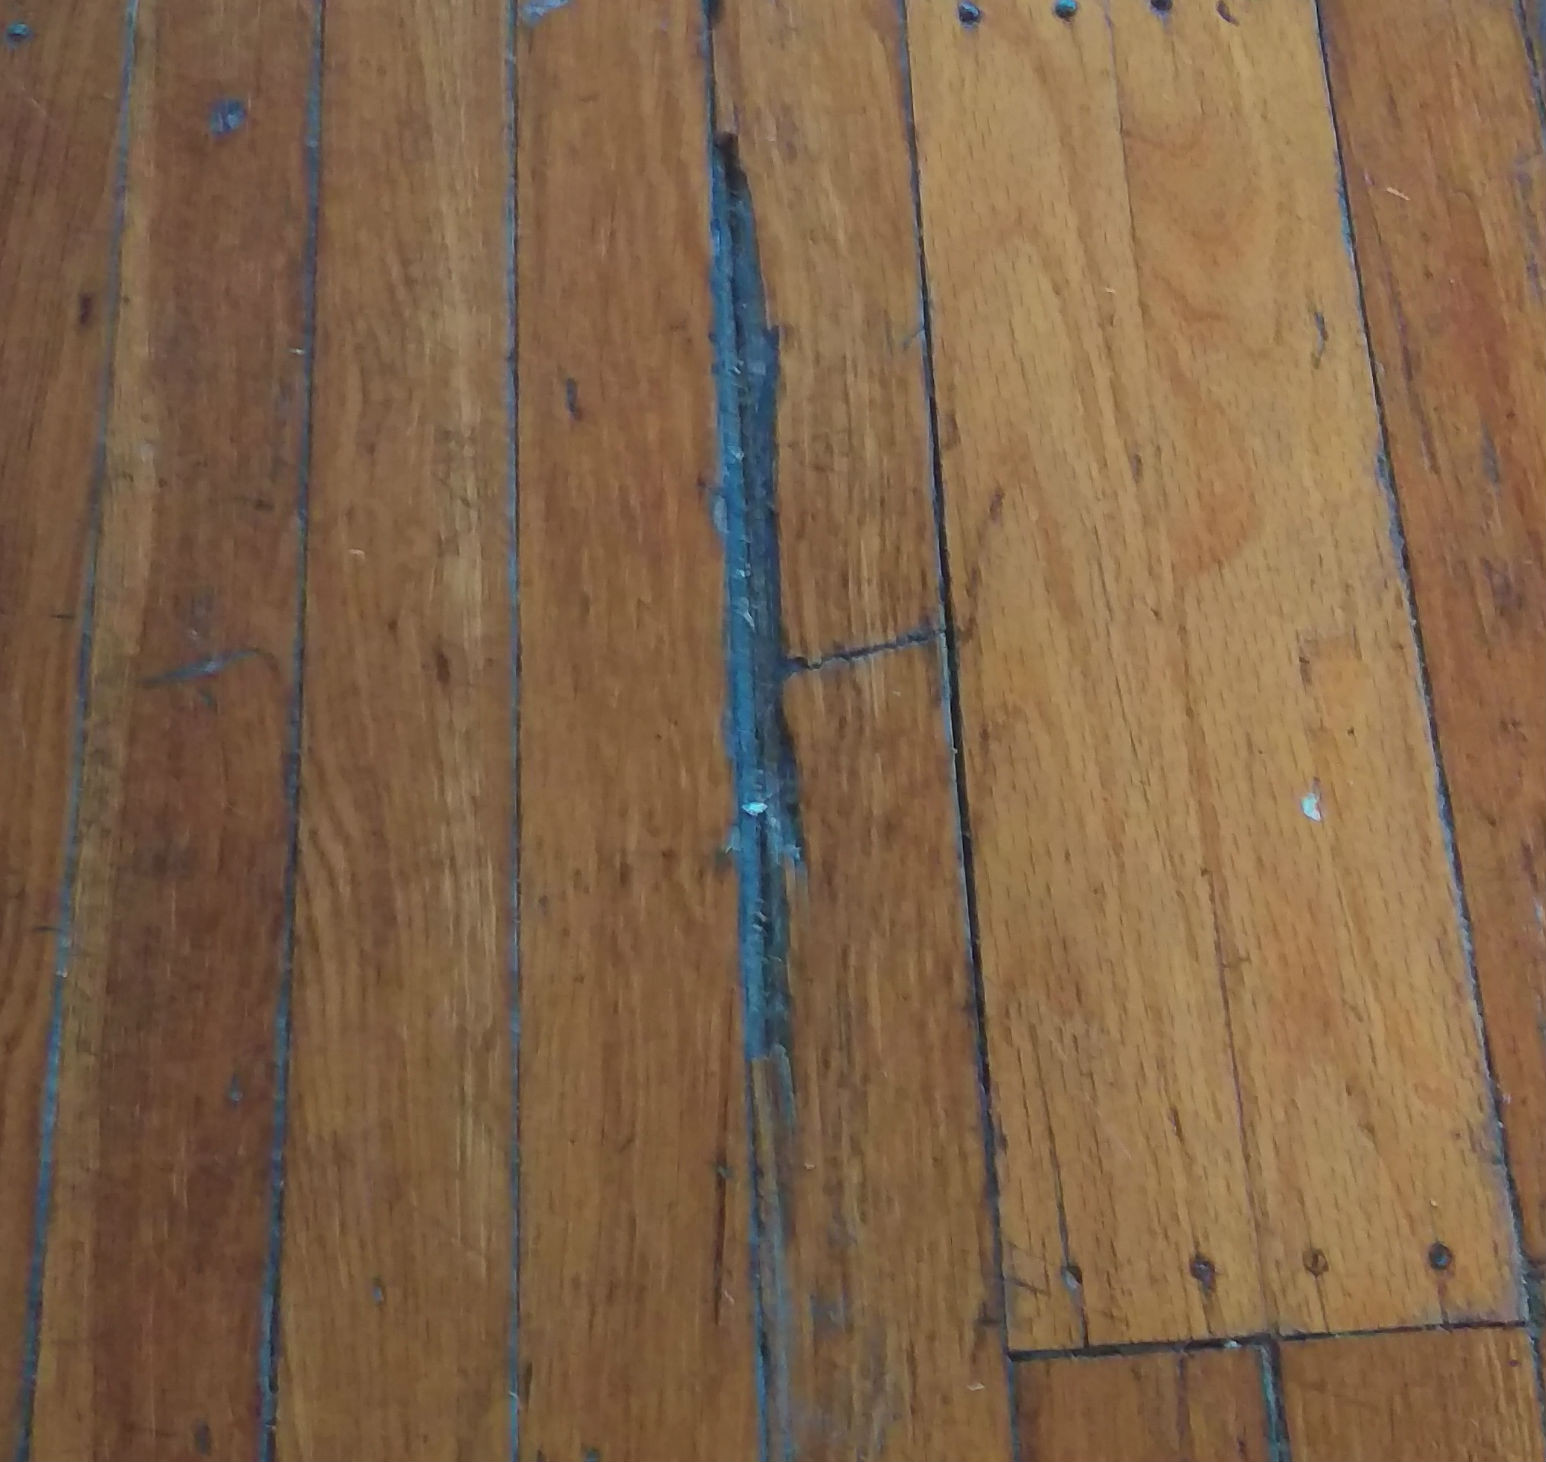 lowes hardwood floor scratch repair of hardwood floor filler lowes strawberryperl org for smartness design hardwood floor filler lowes 2